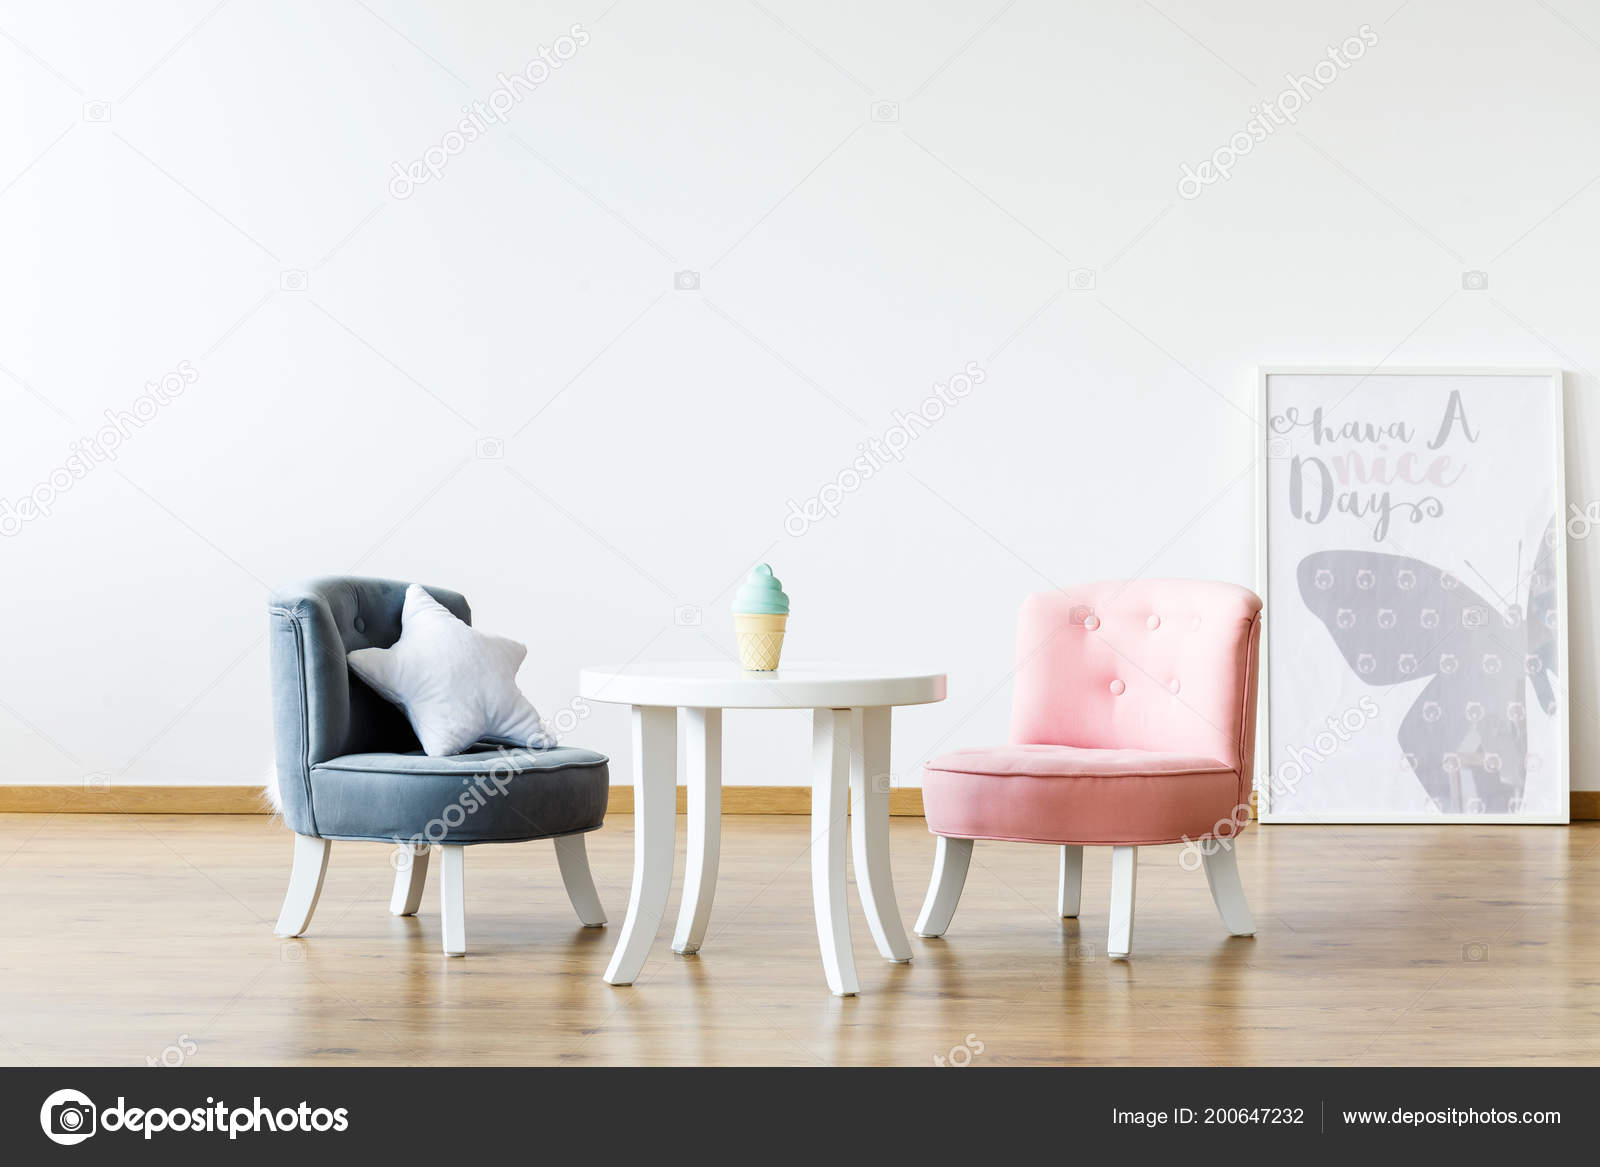 Pastel stoelen aan witte tafel meisje van kamer interieur met